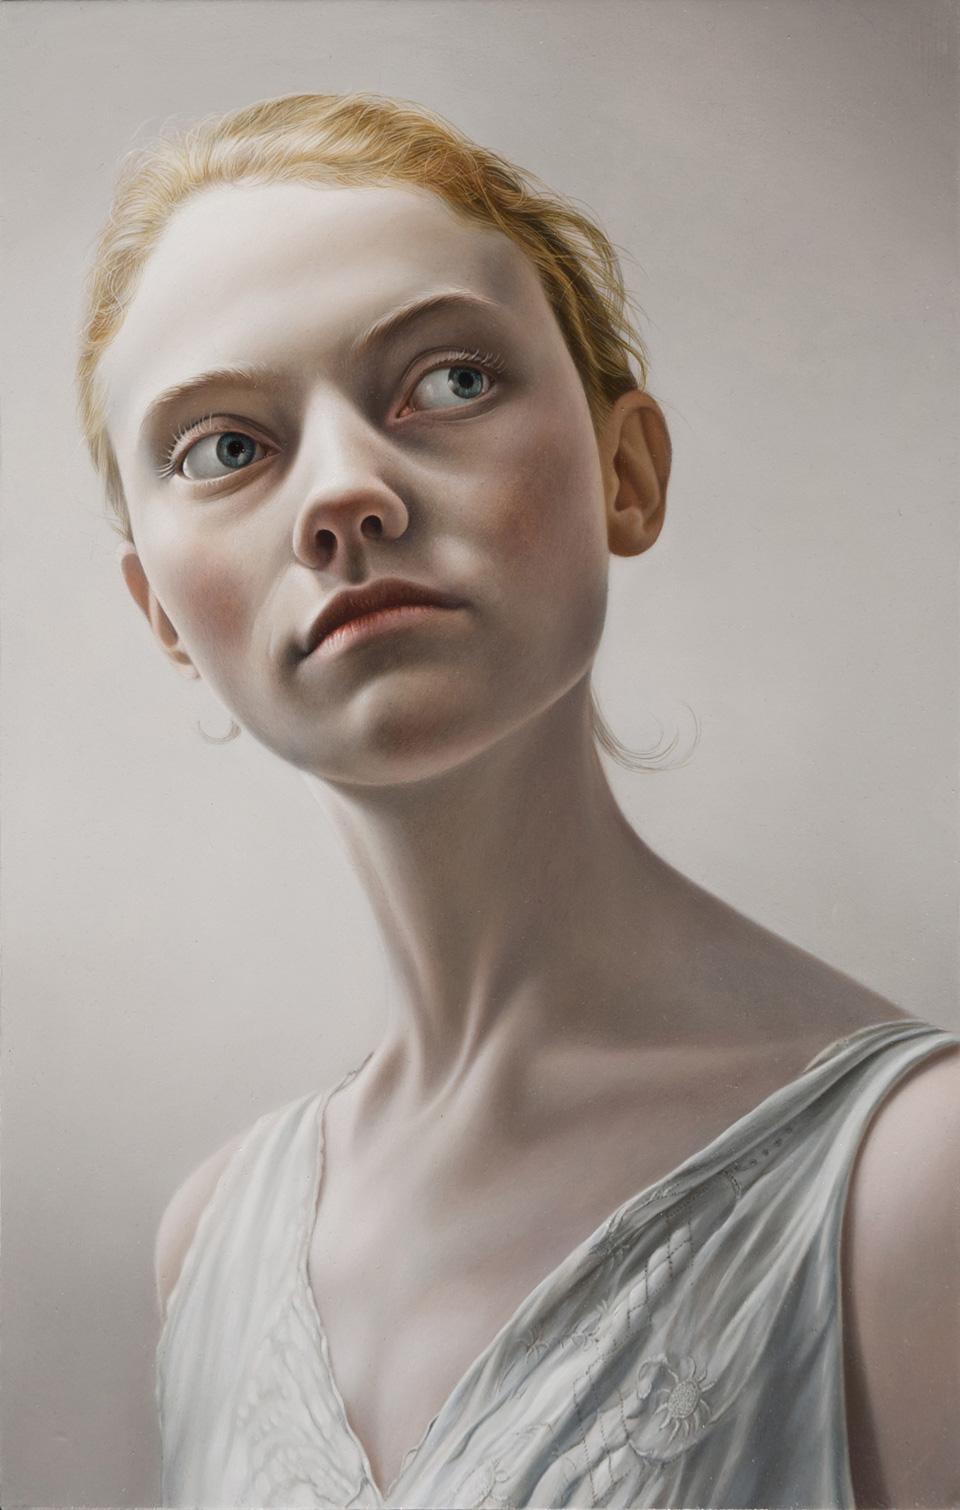 Georgie   Oil on Panel  Selected for BP Portrait Award 2011 National Portrait Gallery UK